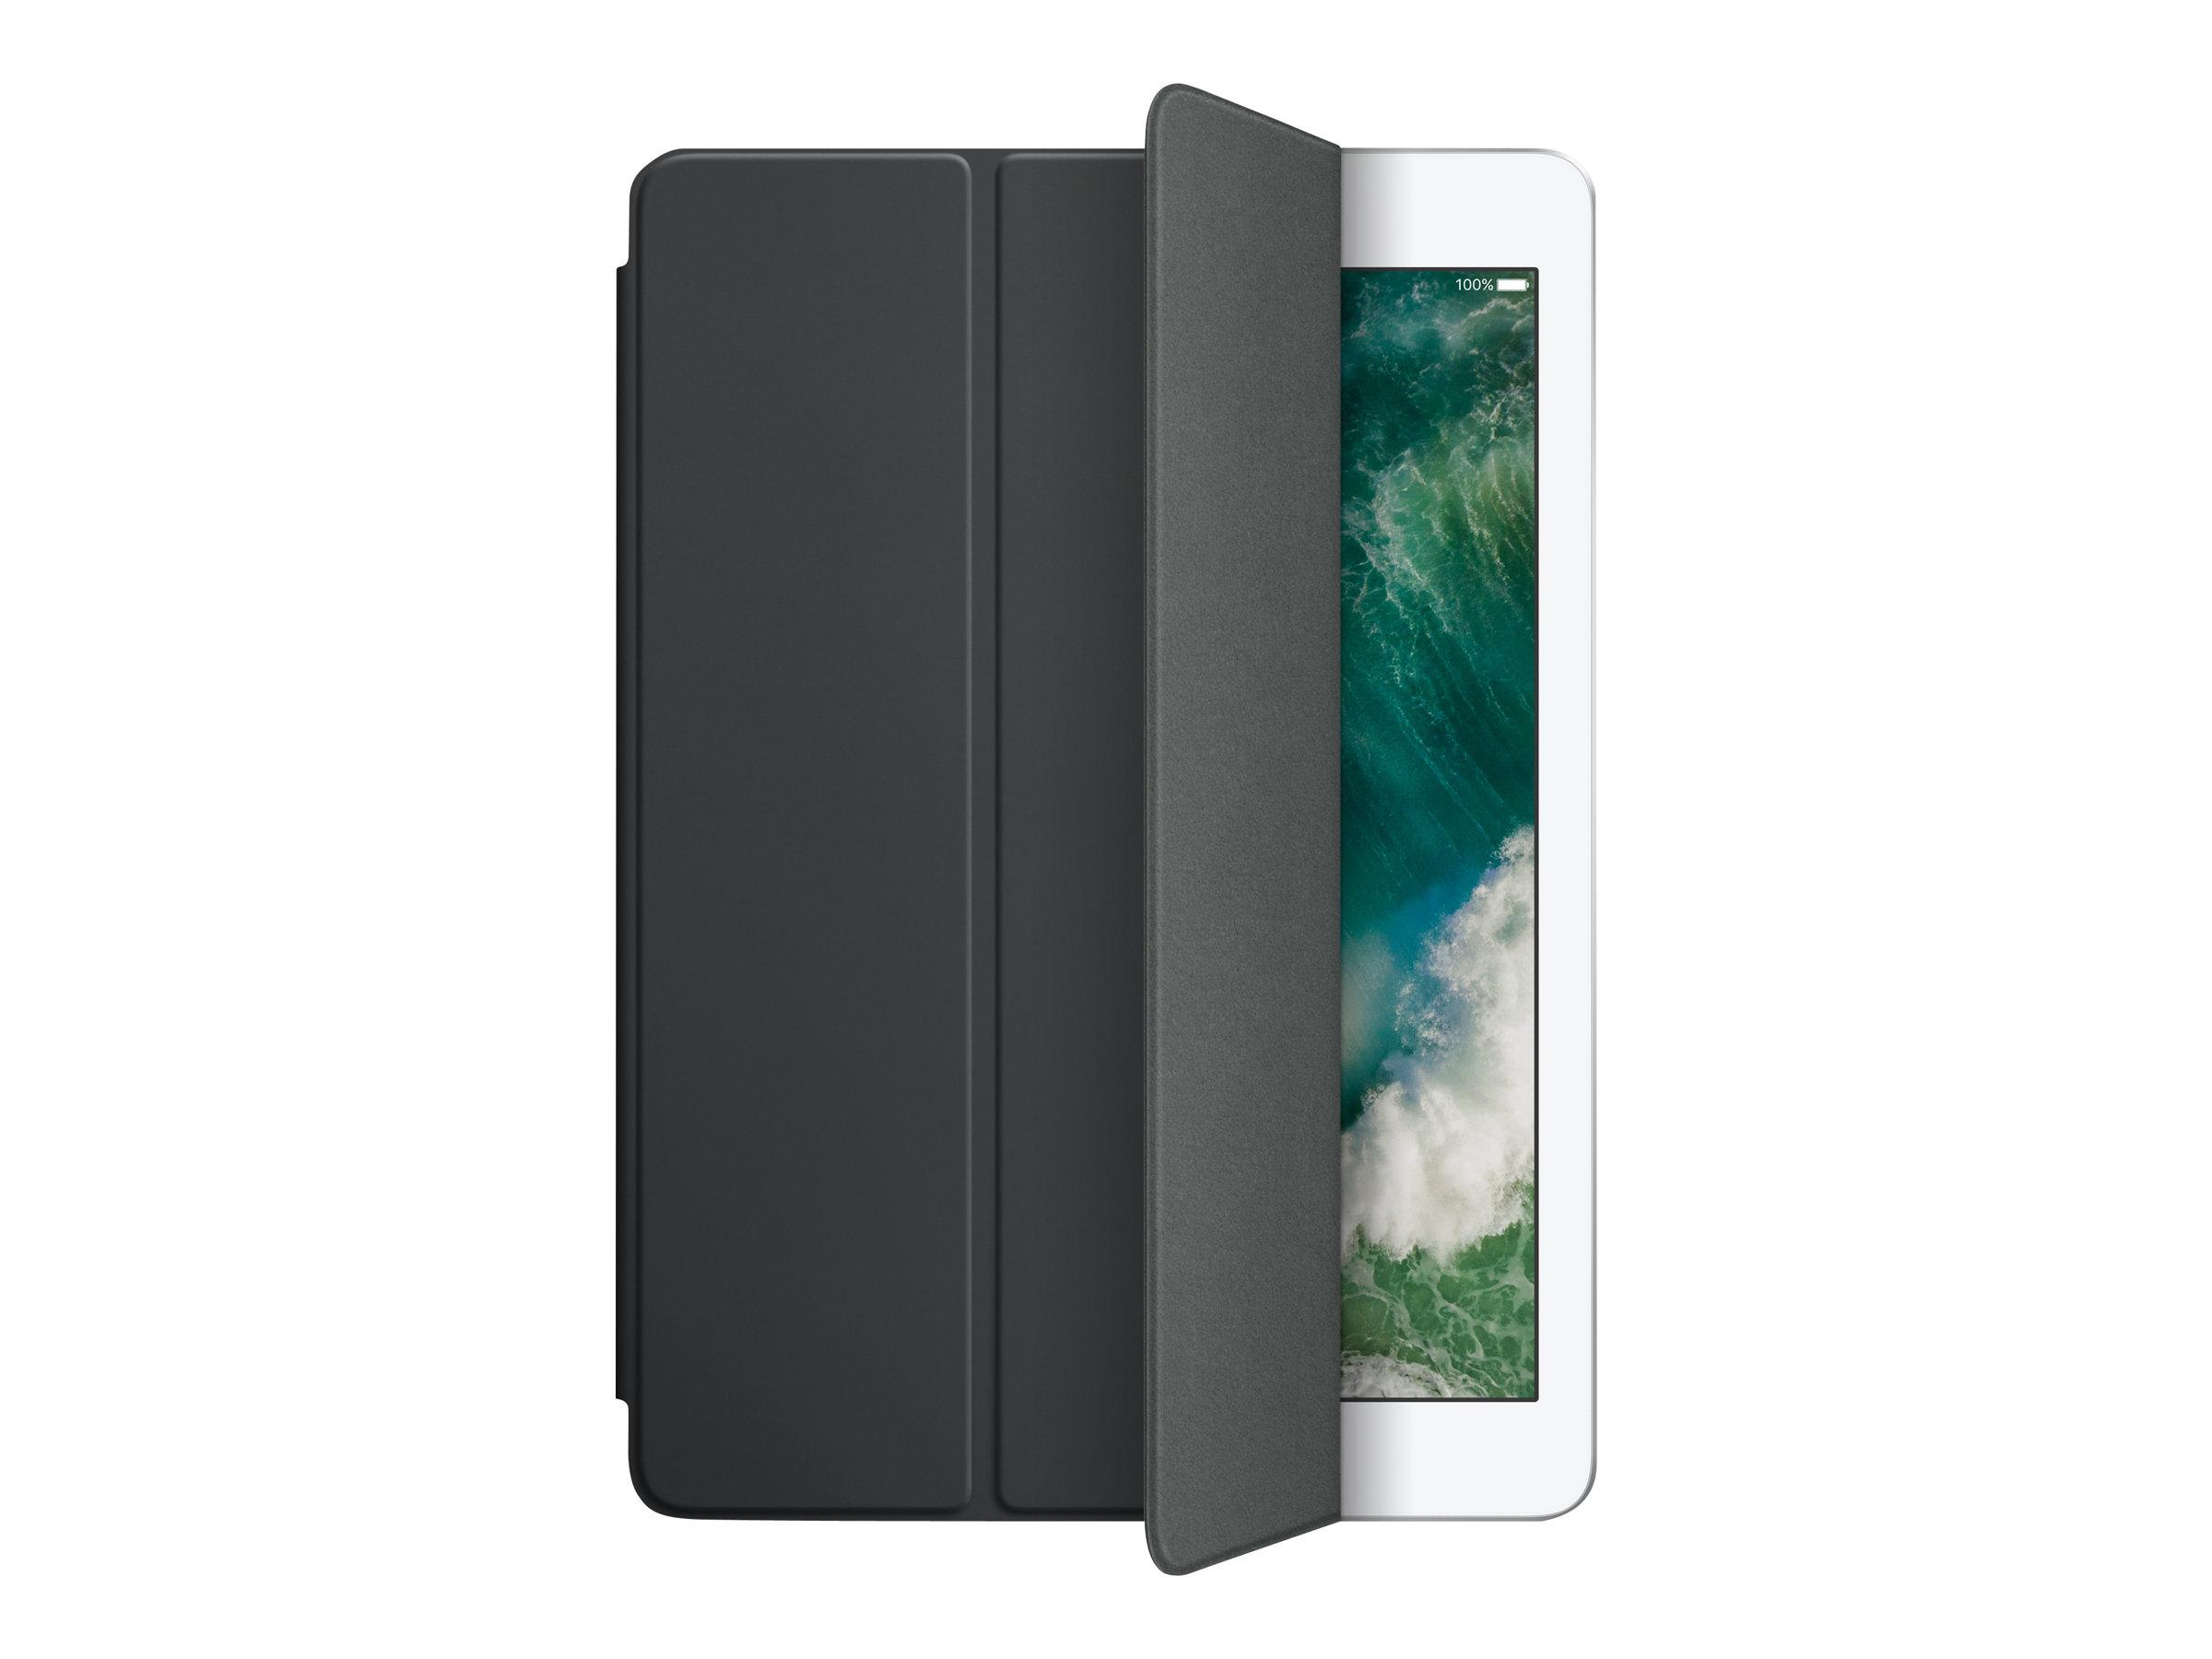 Apple Smart - Flip-Hülle für Tablet - Polyurethan - Charcoal Grey - für 9.7-inch iPad (5. Generation, 6. Generation)